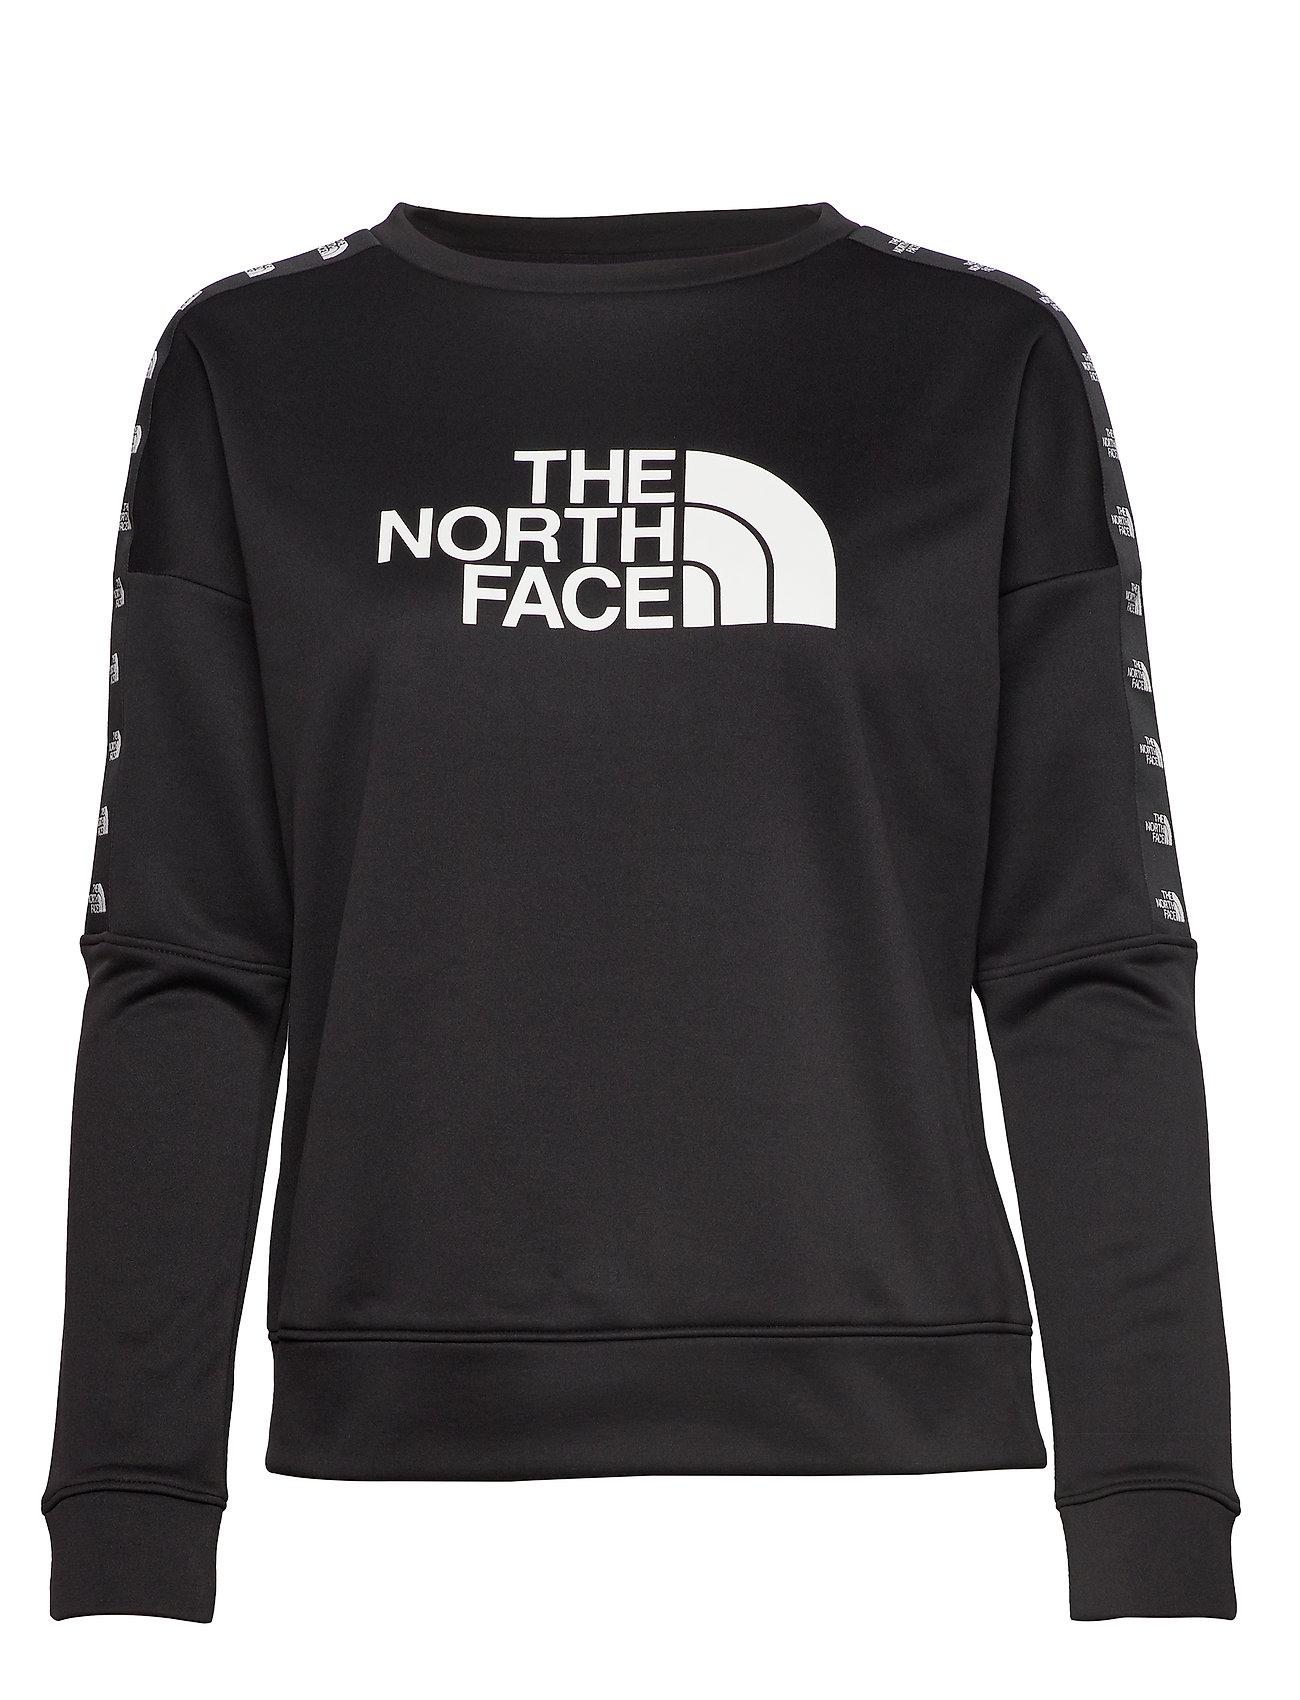 The North Face W TNL CREW SWEATSHIR - TNF BLACK